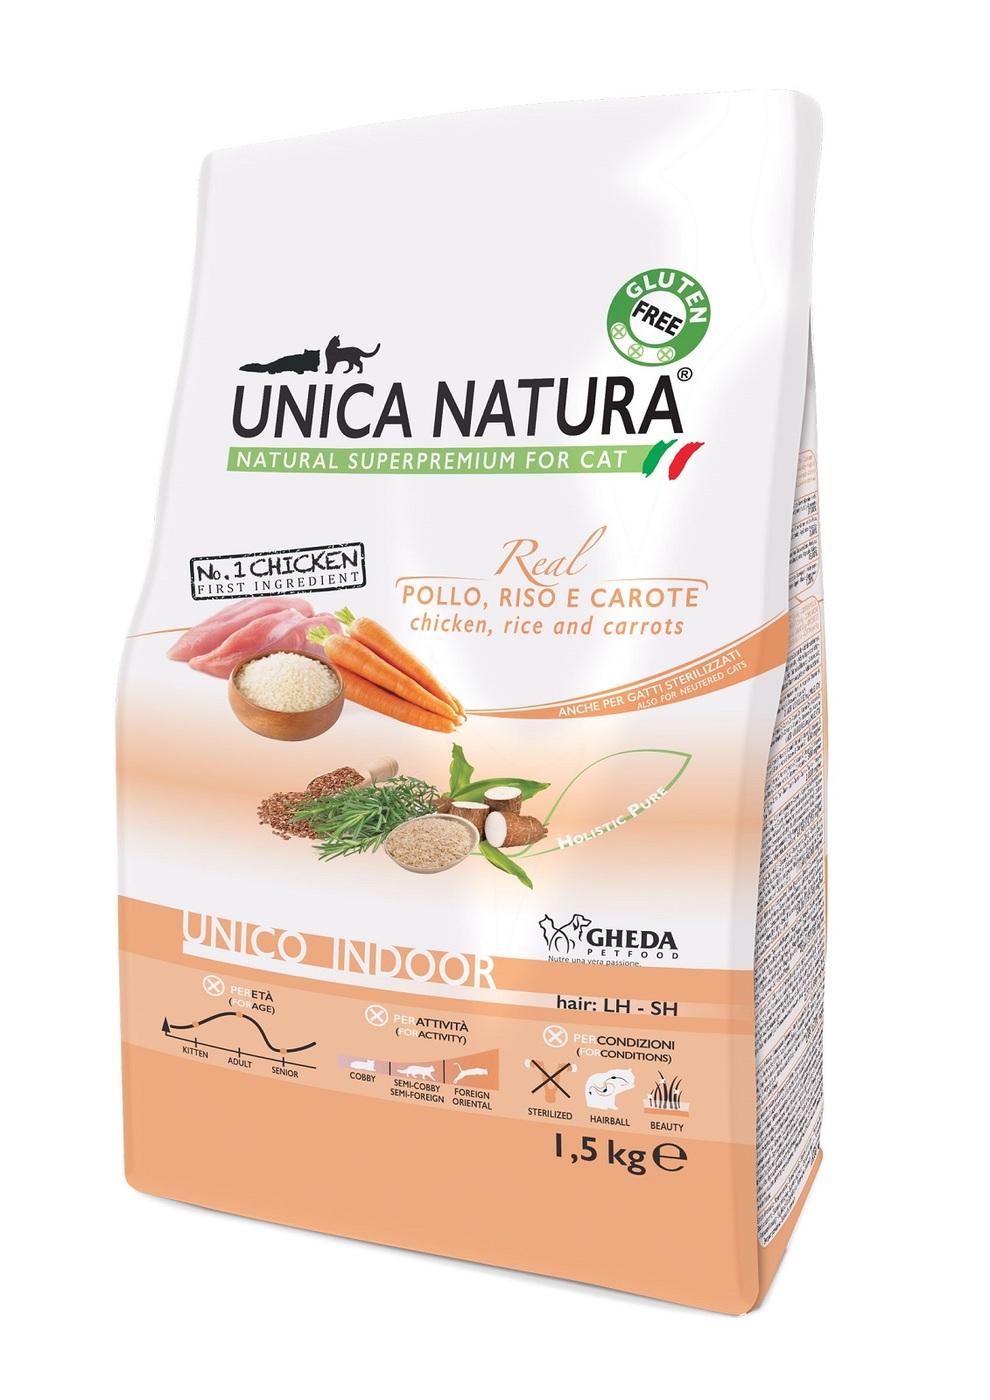 Сухой корм для кошек Unica Natura Unico Indoor - курица, рис, морковь (1,5кг)